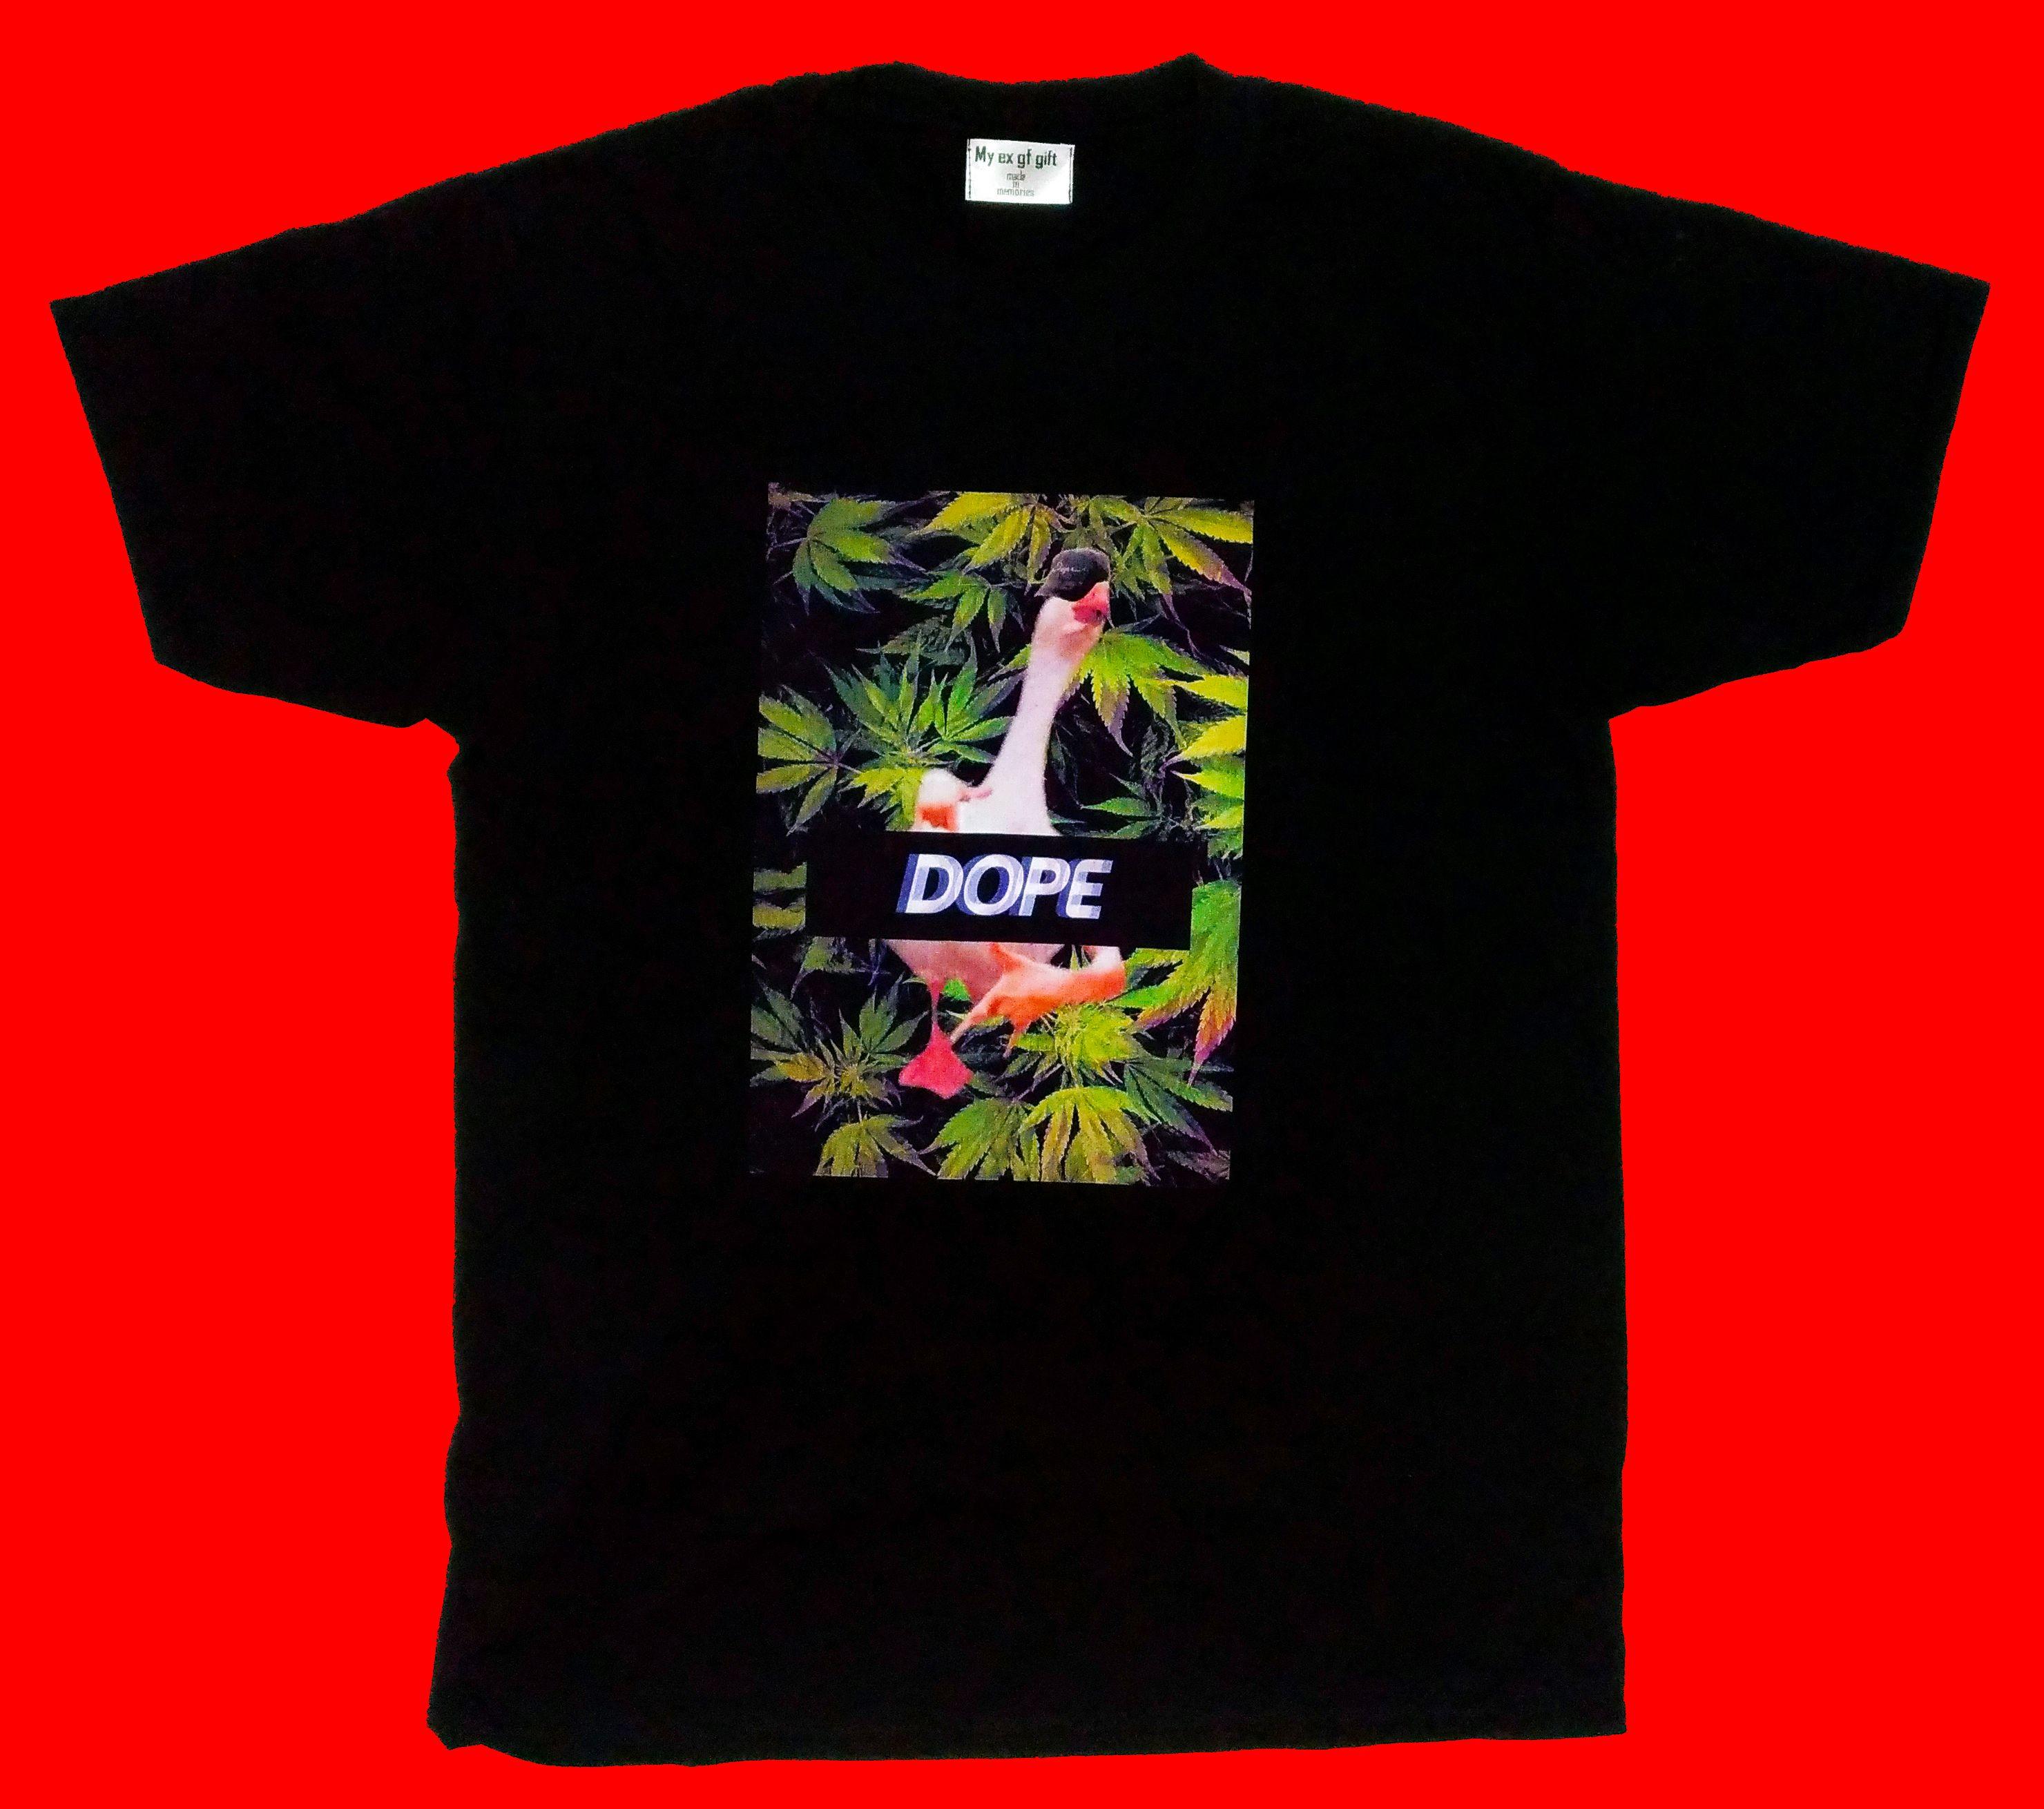 myexgfgift.com  Dopeduck #myexgfgift  #Dope #duck #streetwear #tshirt #ootdshare #ootd #fashion #teeshirt #memories #weed #yo